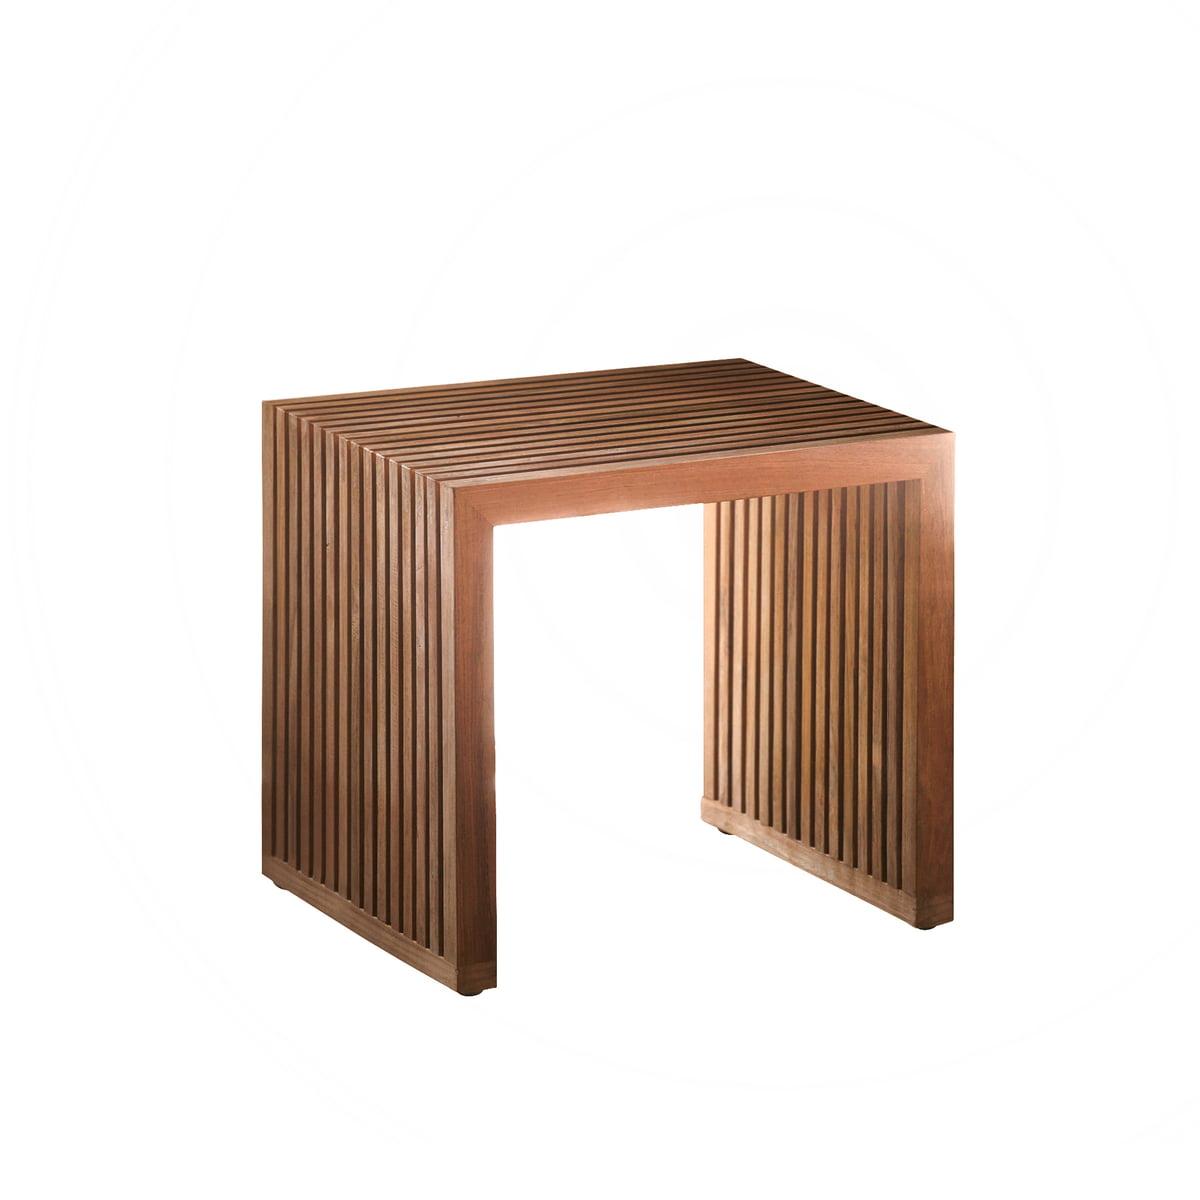 tivoli hocker von jan kurtz connox shop. Black Bedroom Furniture Sets. Home Design Ideas